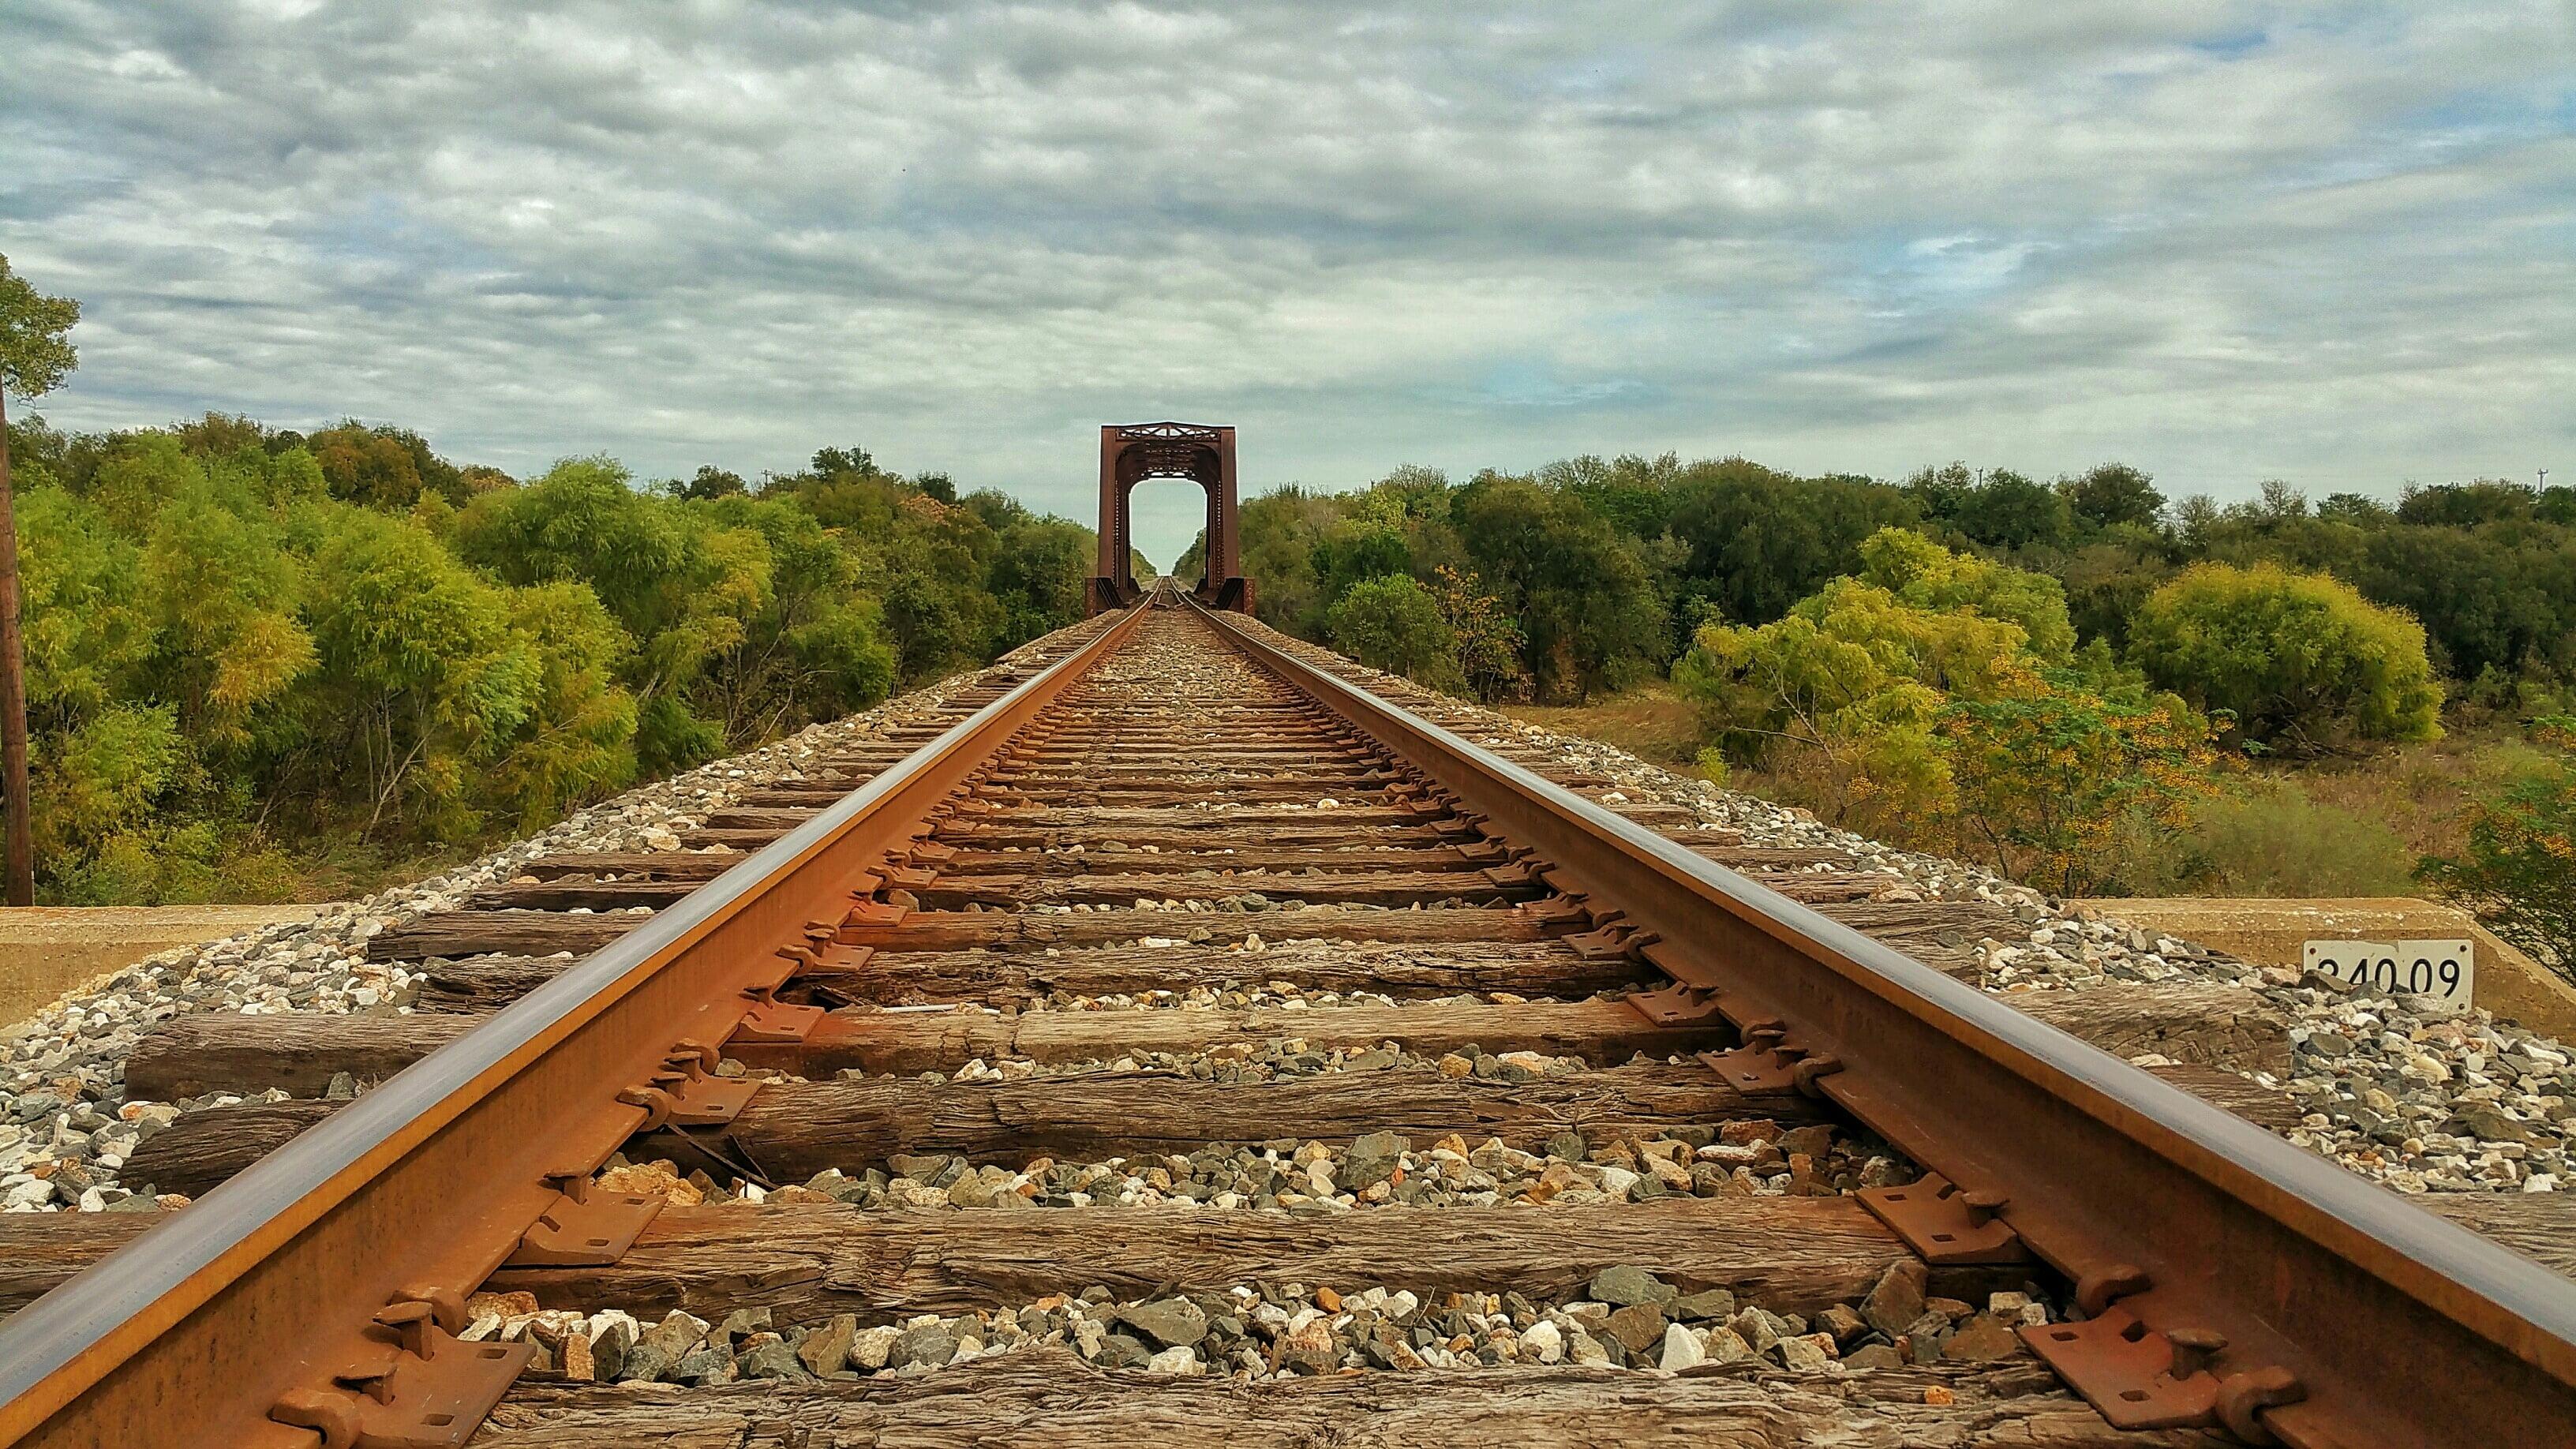 Rusty gray metal train rails close up photo HD wallpaper | Wallpaper ...